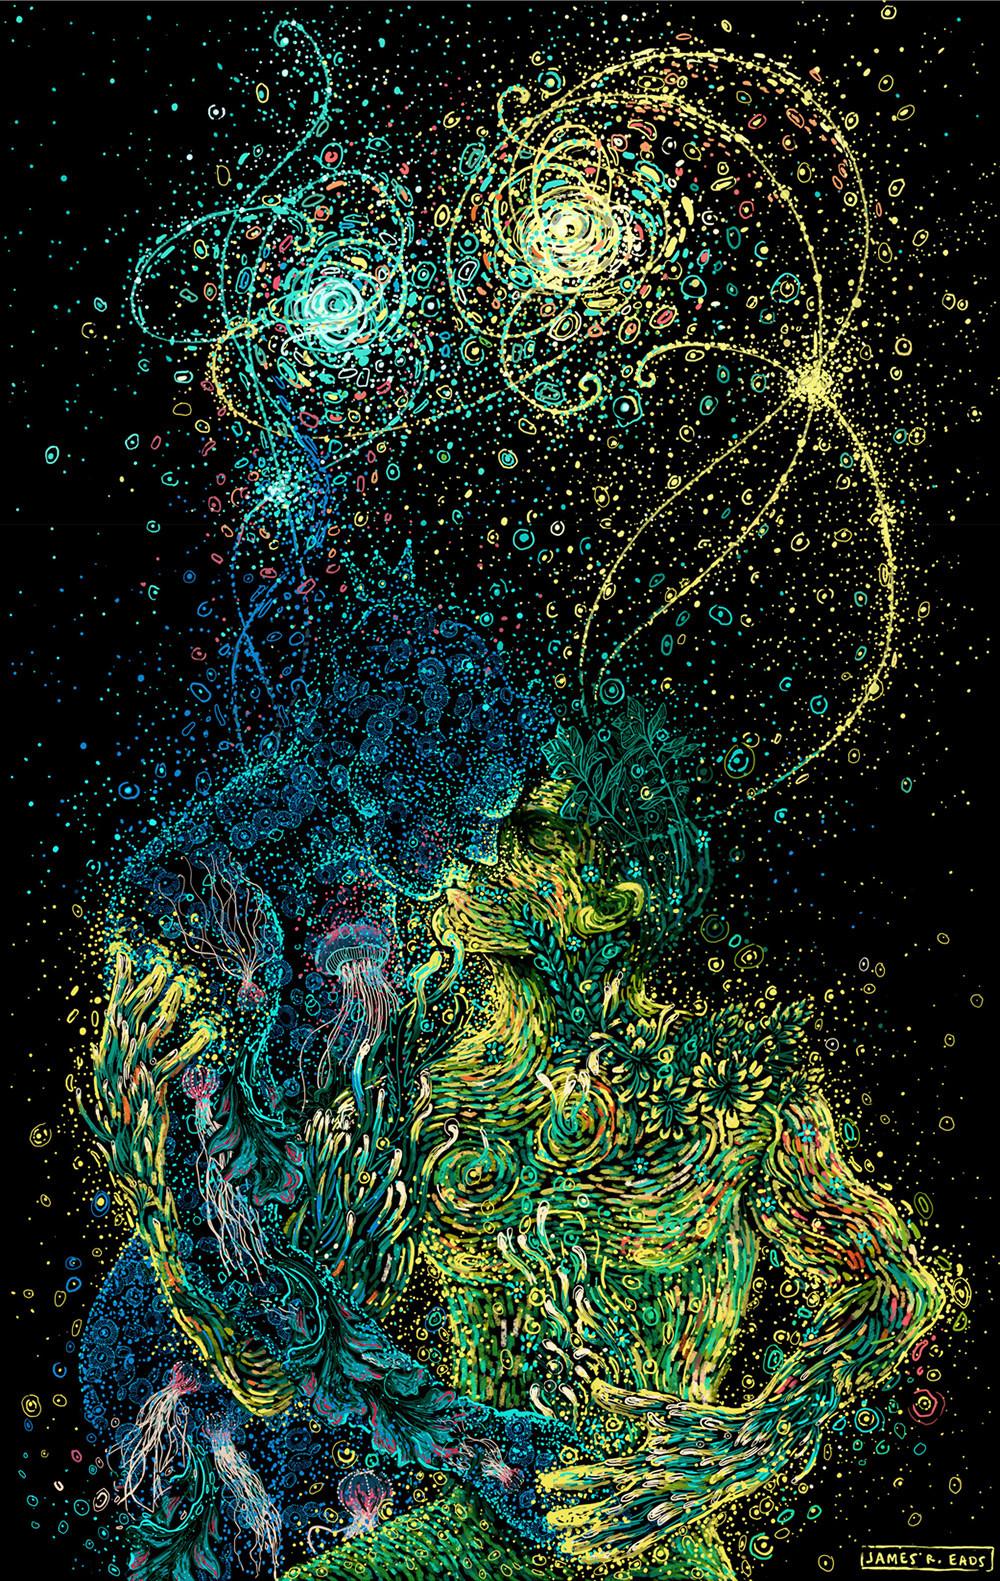 James R. Eads Tutt'Art -Twin Flames